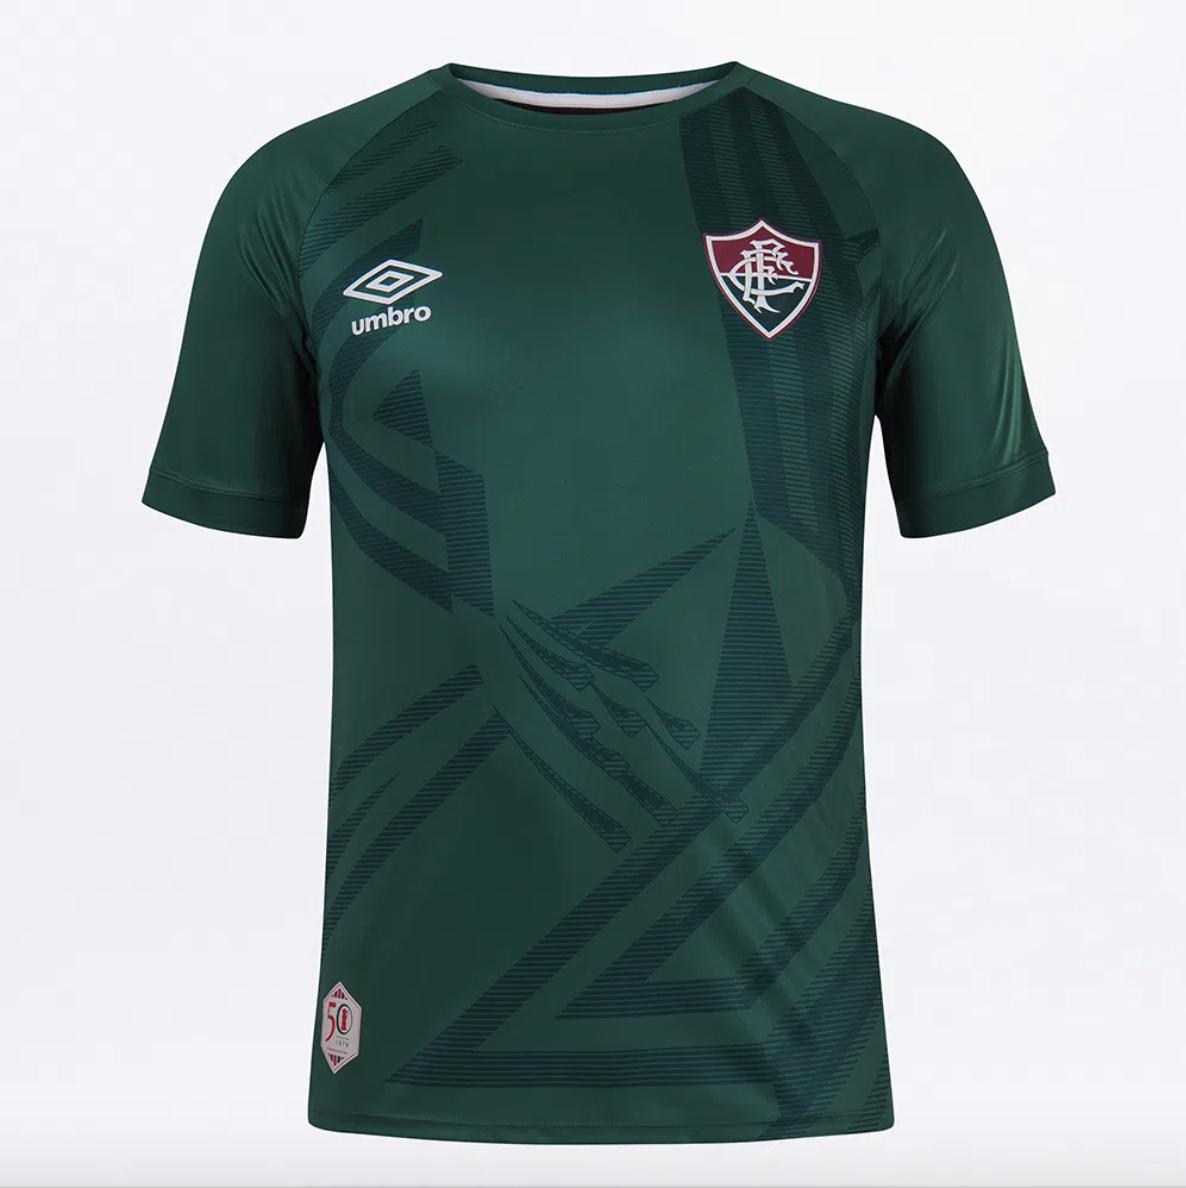 maillot-gardien-fluminense-2020-umbro-2